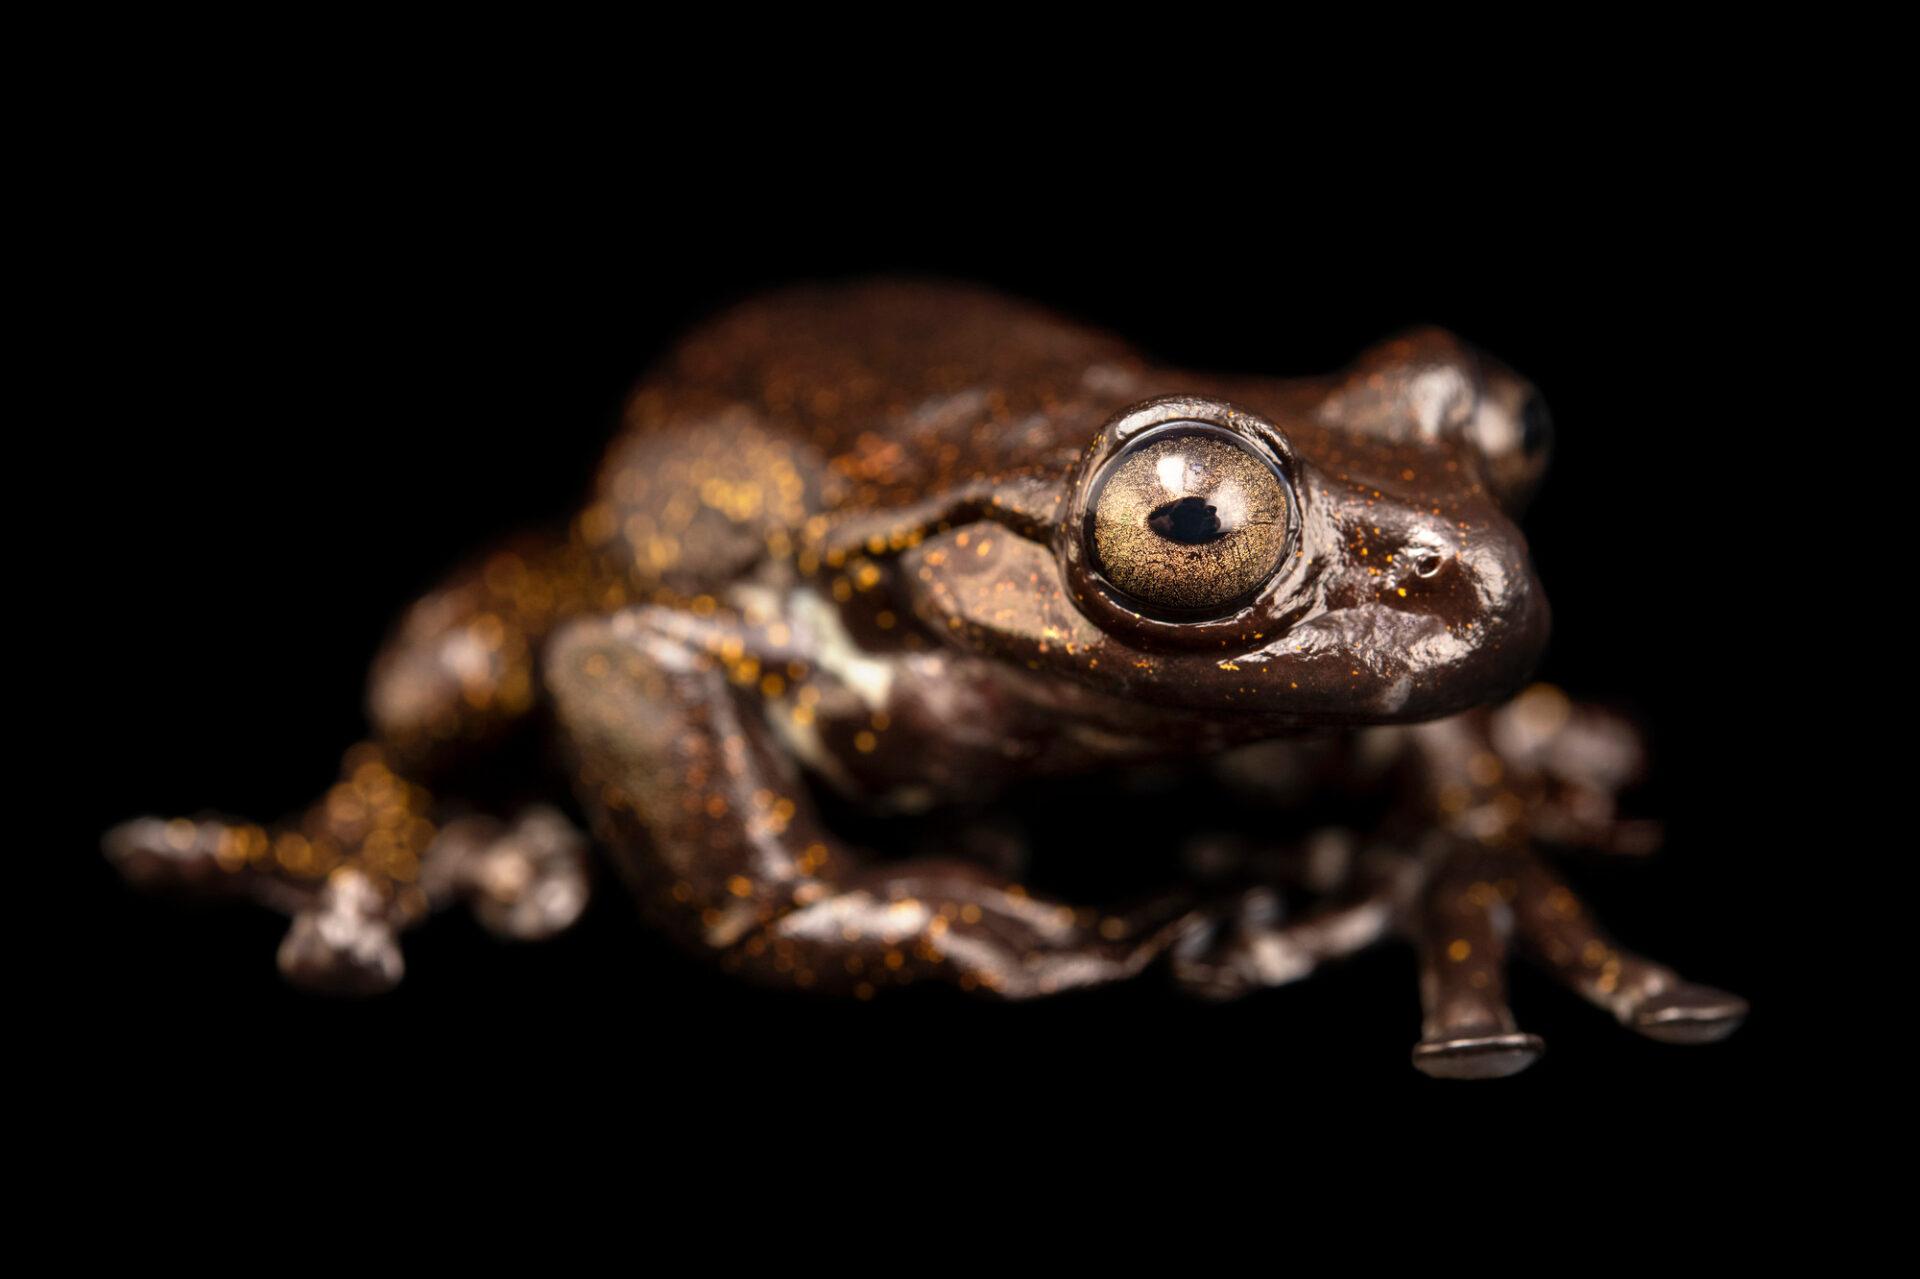 Photo: A tree frog (Hyloscirtus criptico) at Balsa de los Sapos.